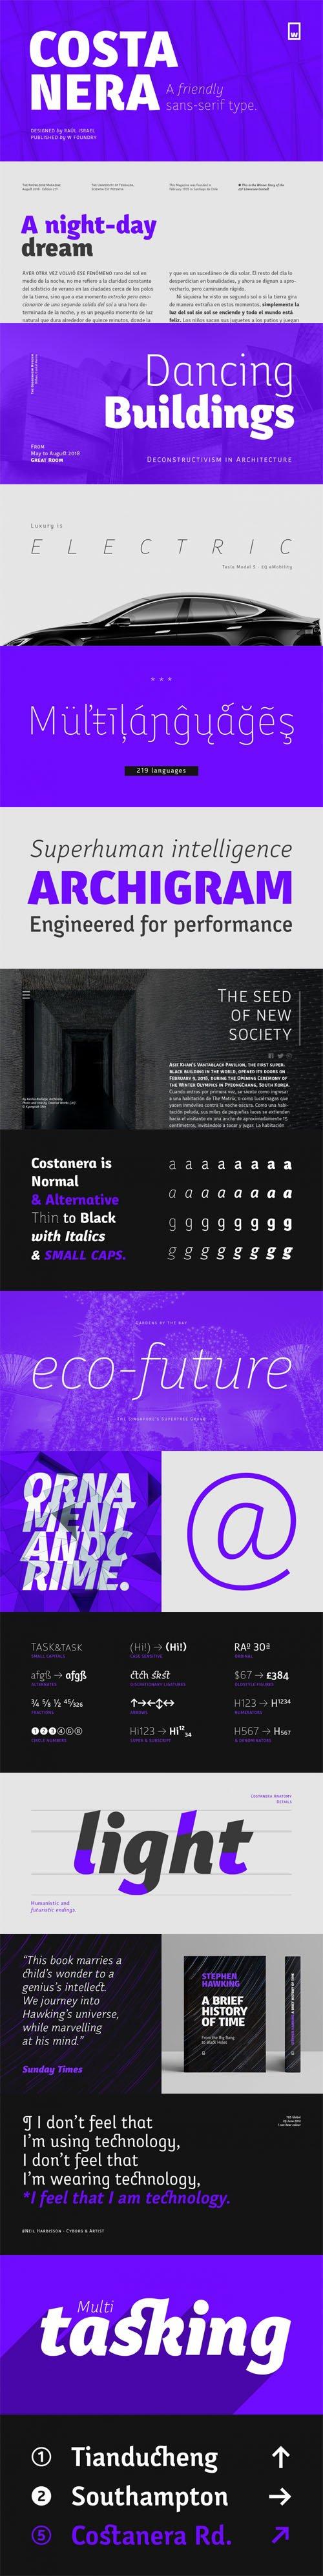 Costanera Sans-Serif Font Family [32-Weights]